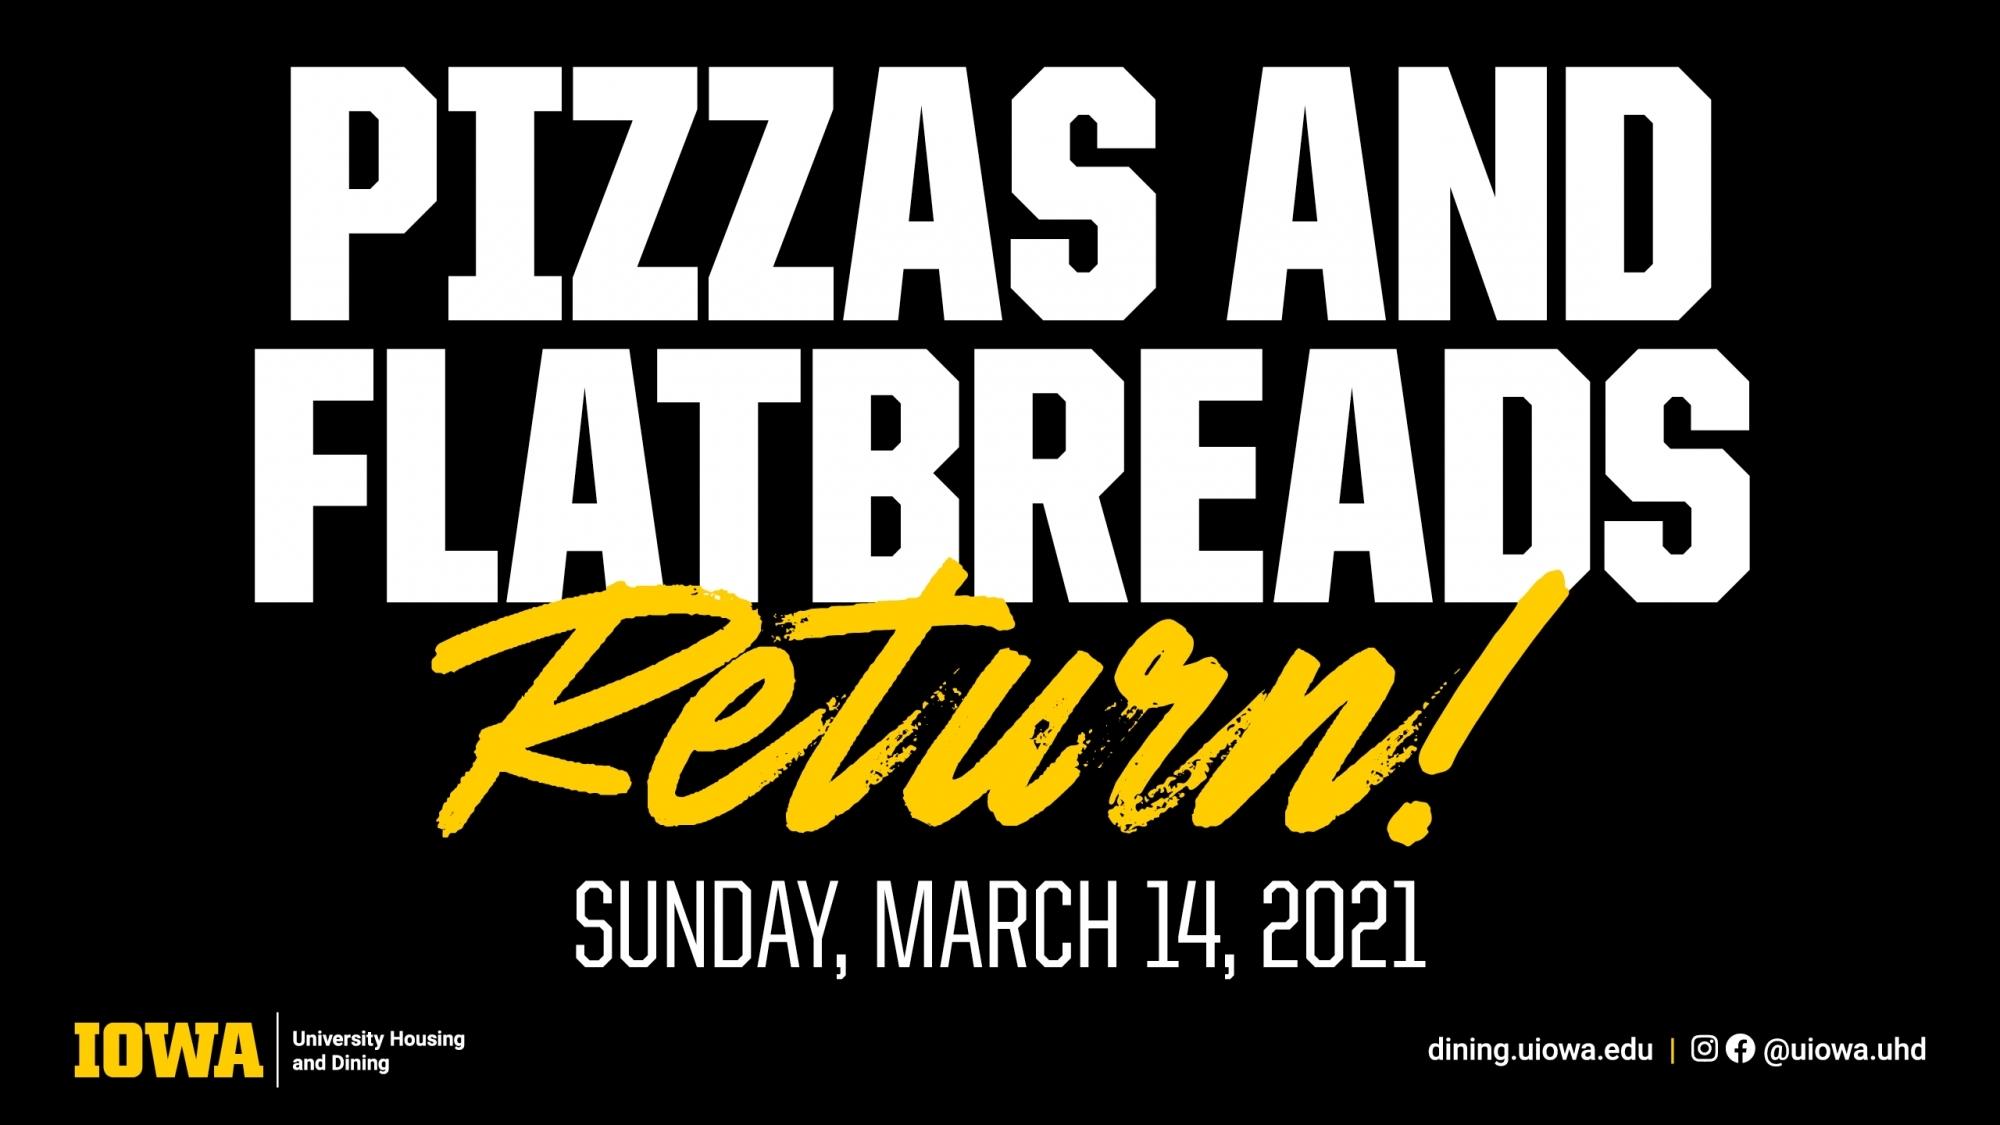 pizzas return